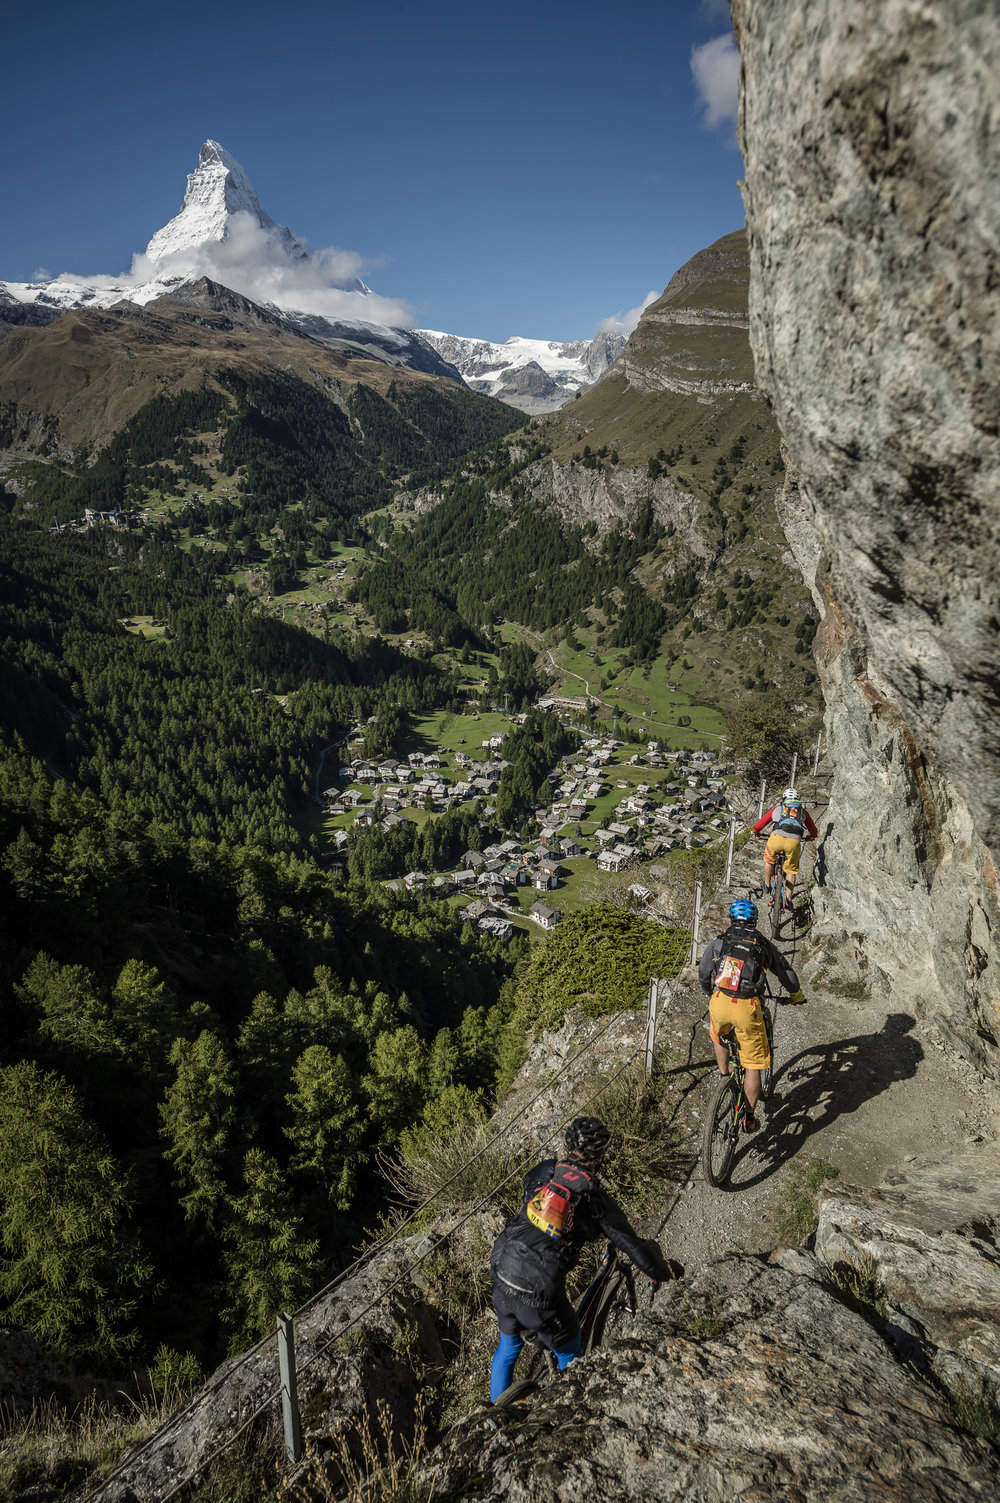 PERSKINDOL_SWISS_EPIC_stage5_WalkingPassage_Matterhorn_credit_APiX.jpg